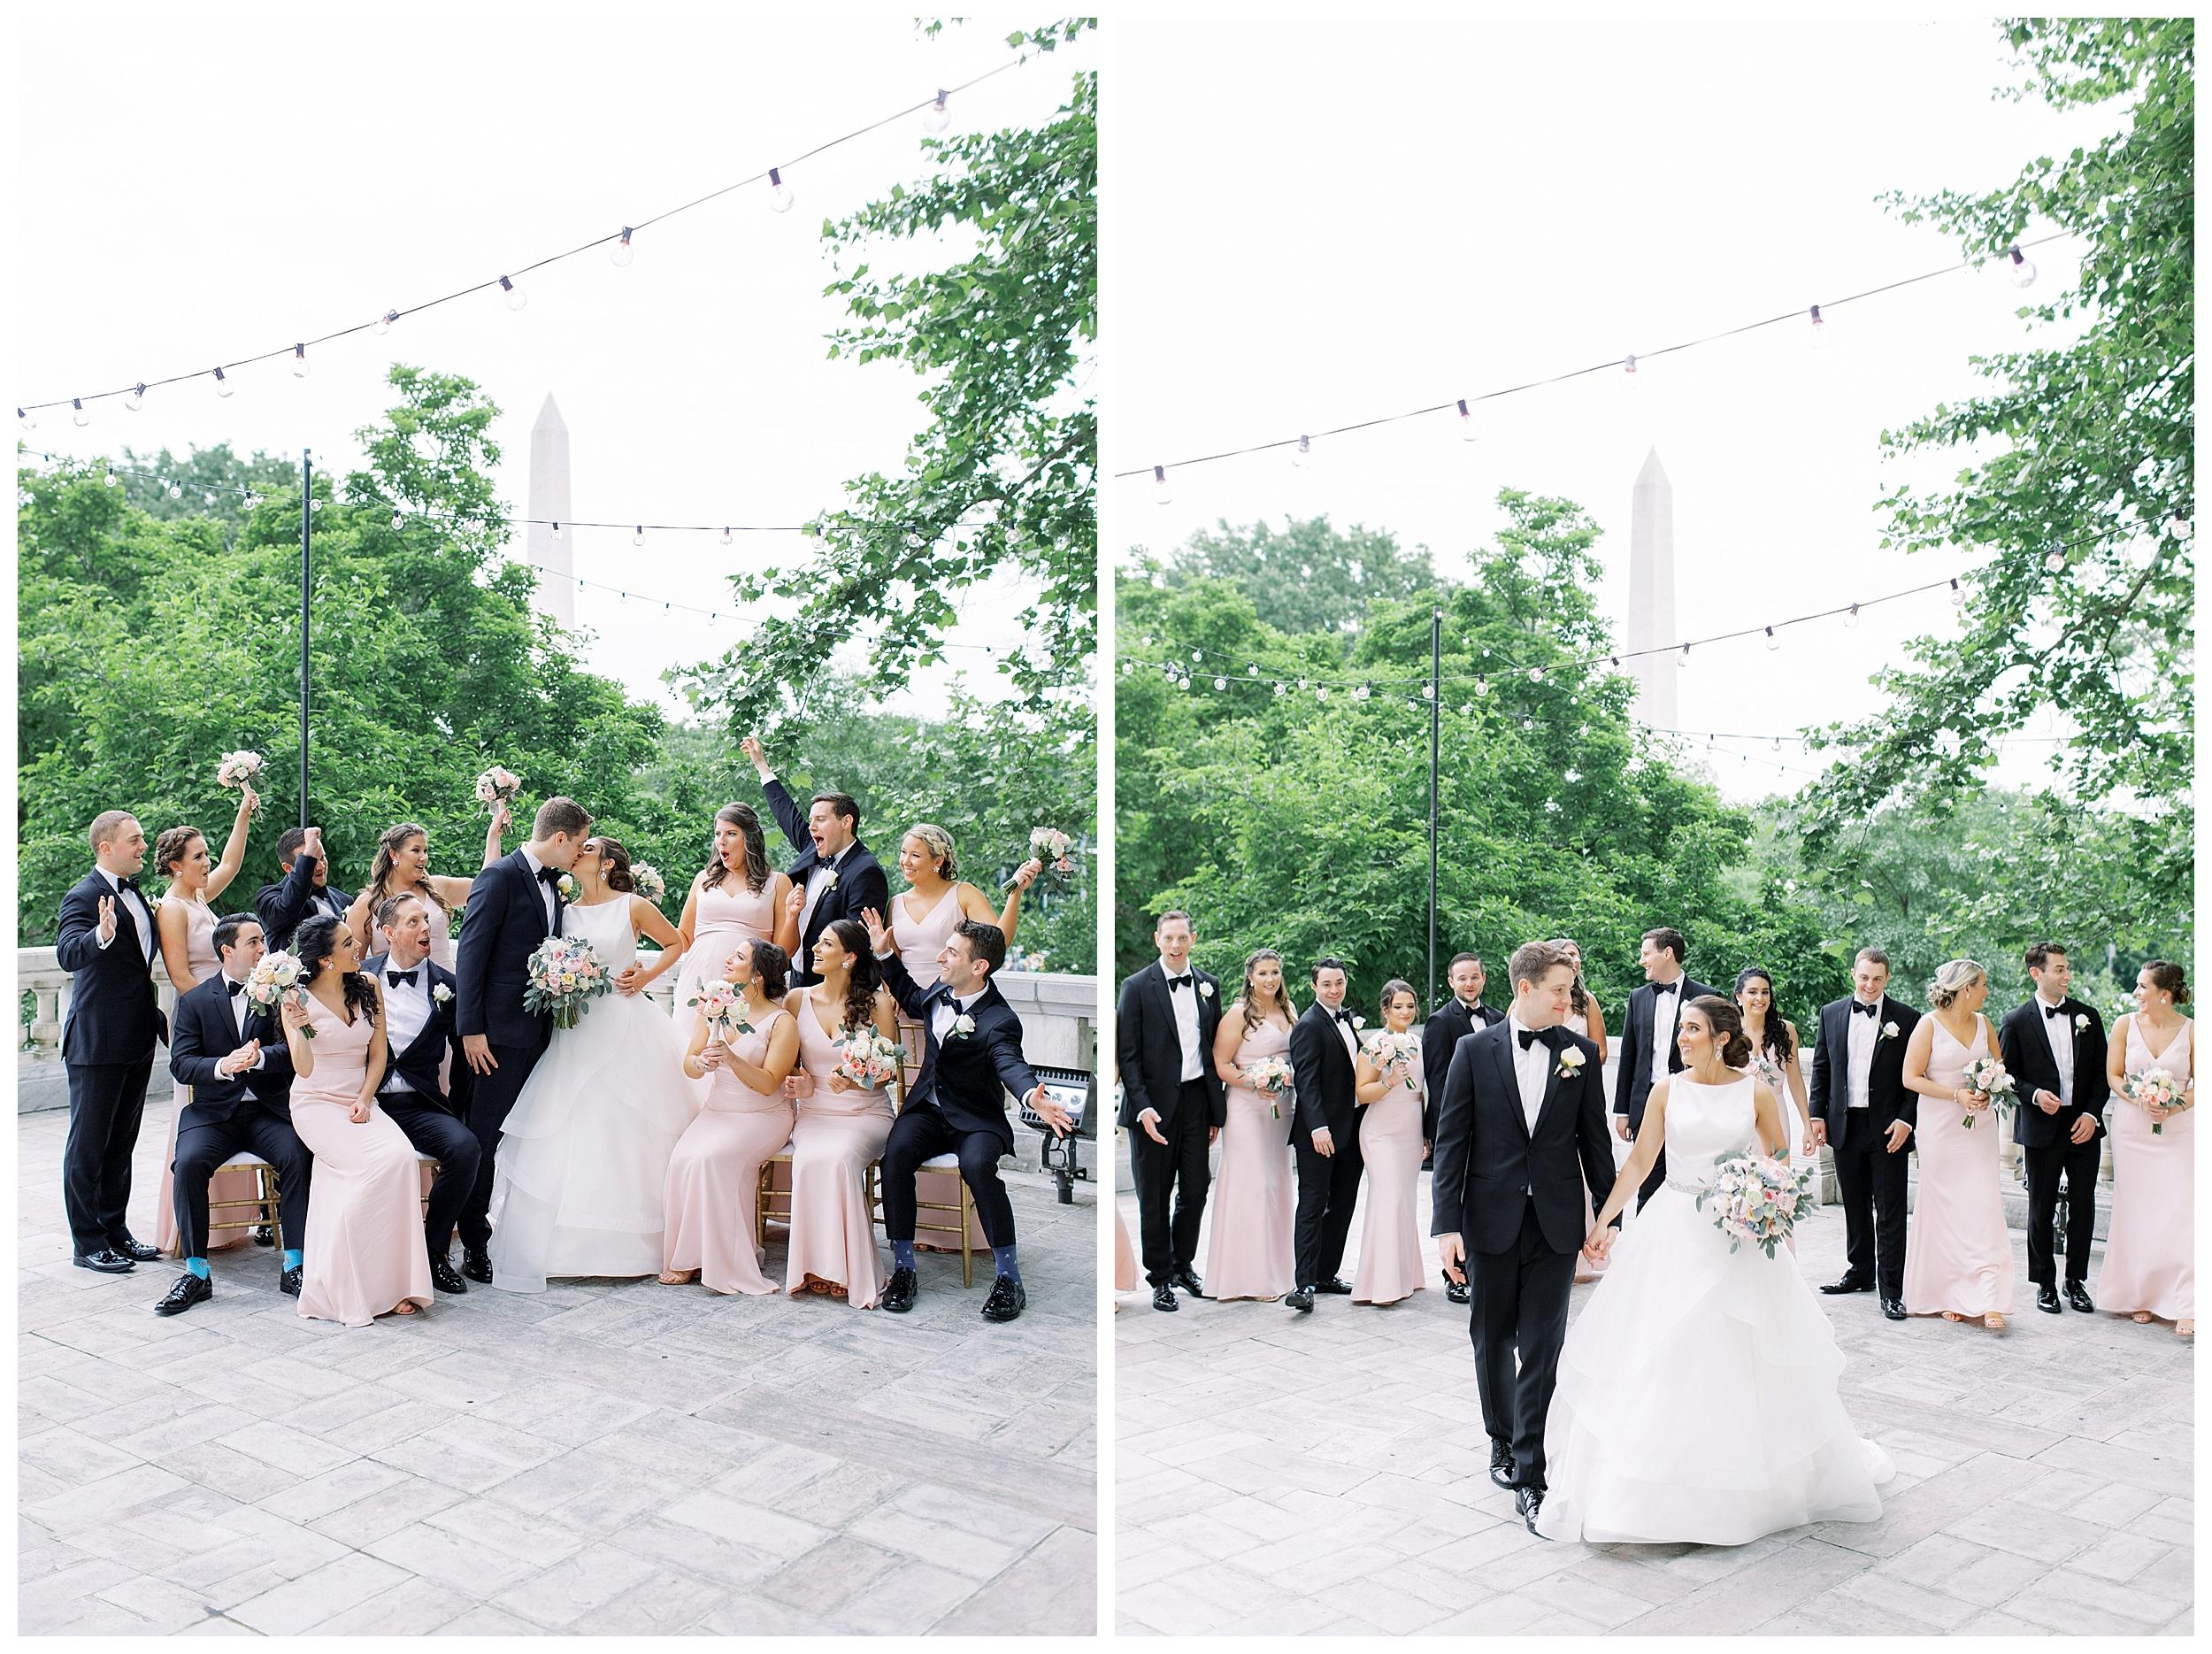 DAR Constitution Hall Wedding Wedding | Daughters of the American Revolution Wedding | District of Columbia Film Wedding Photographer Kir Tuben_0082.jpg